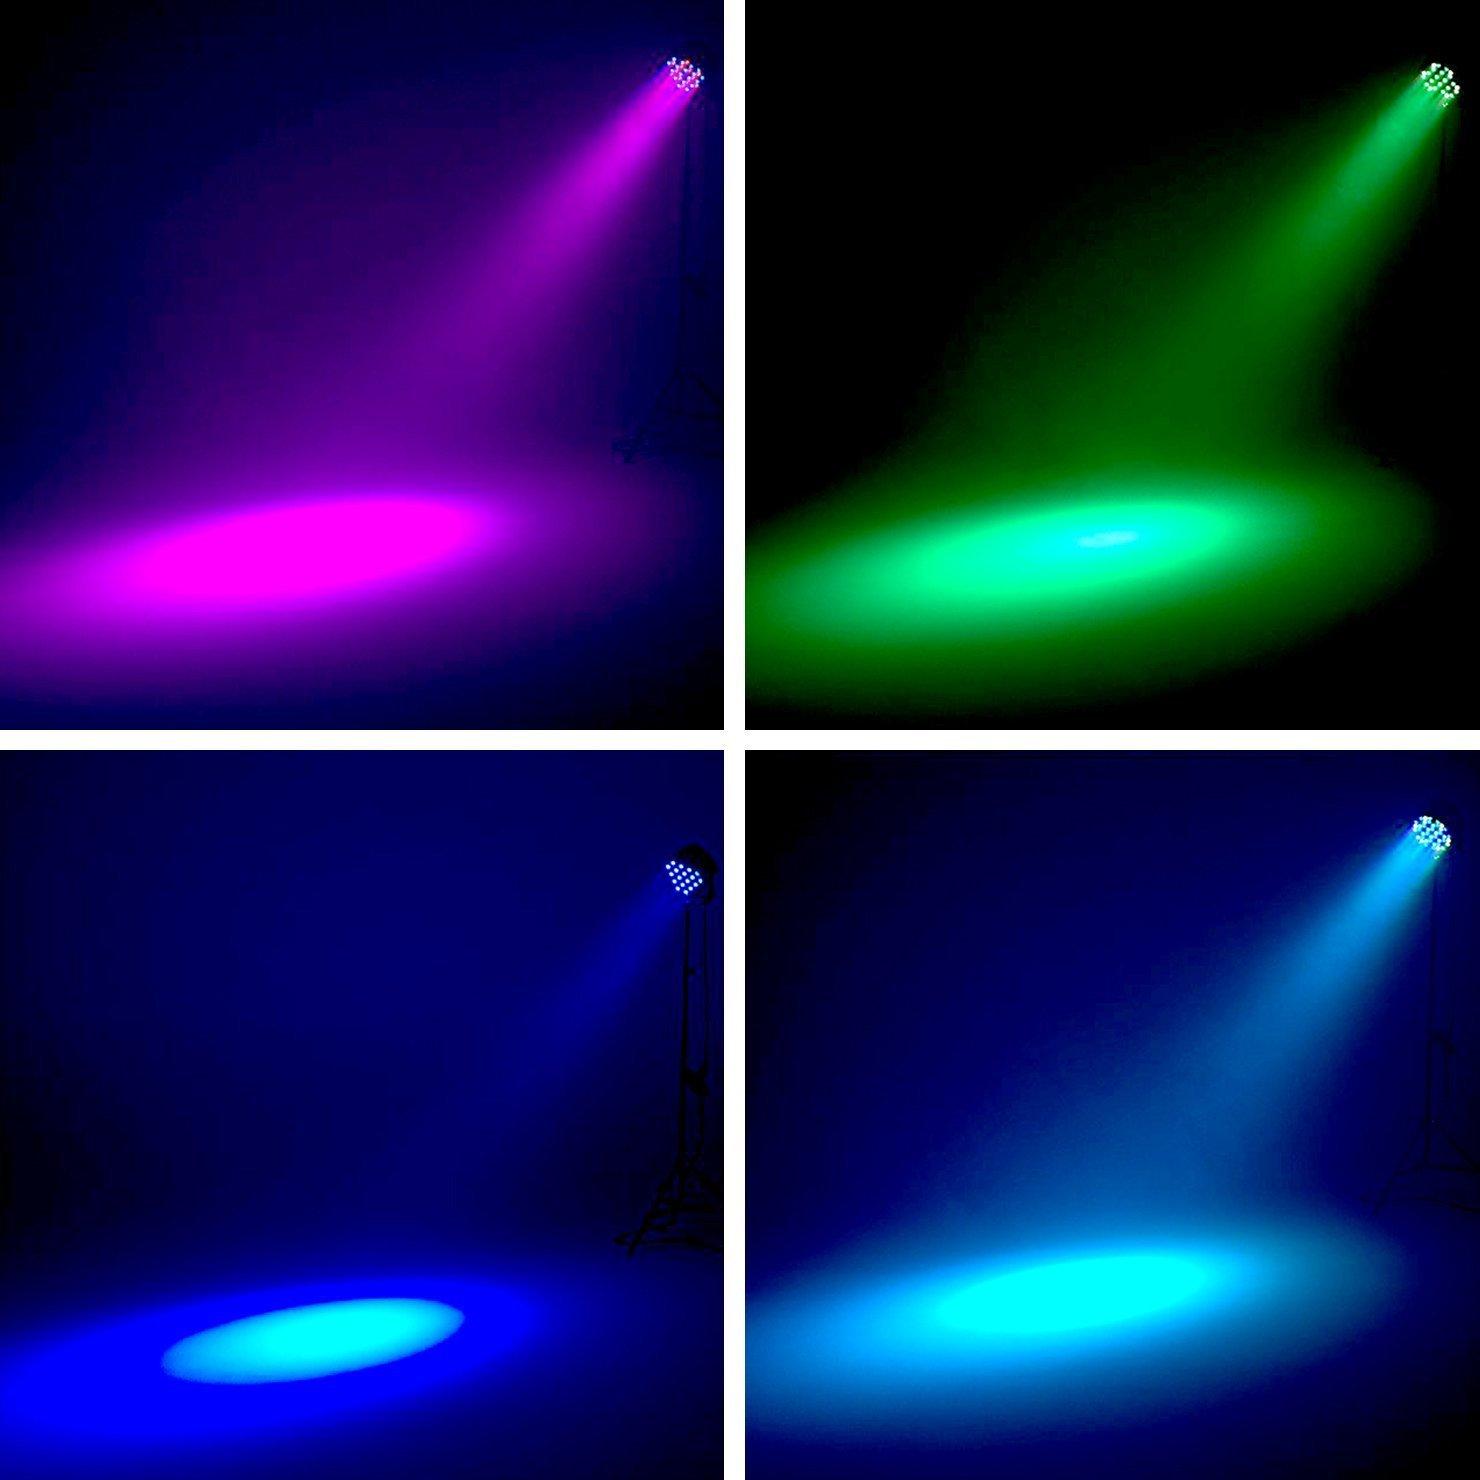 Eyourlife Led Stage Lights 8pcs 54x3w Dj Par Light Circuit Board Lightings Rgbw 162watt Dmx 512 Lighting Disco Projector For Home Wedding Party Church Concert